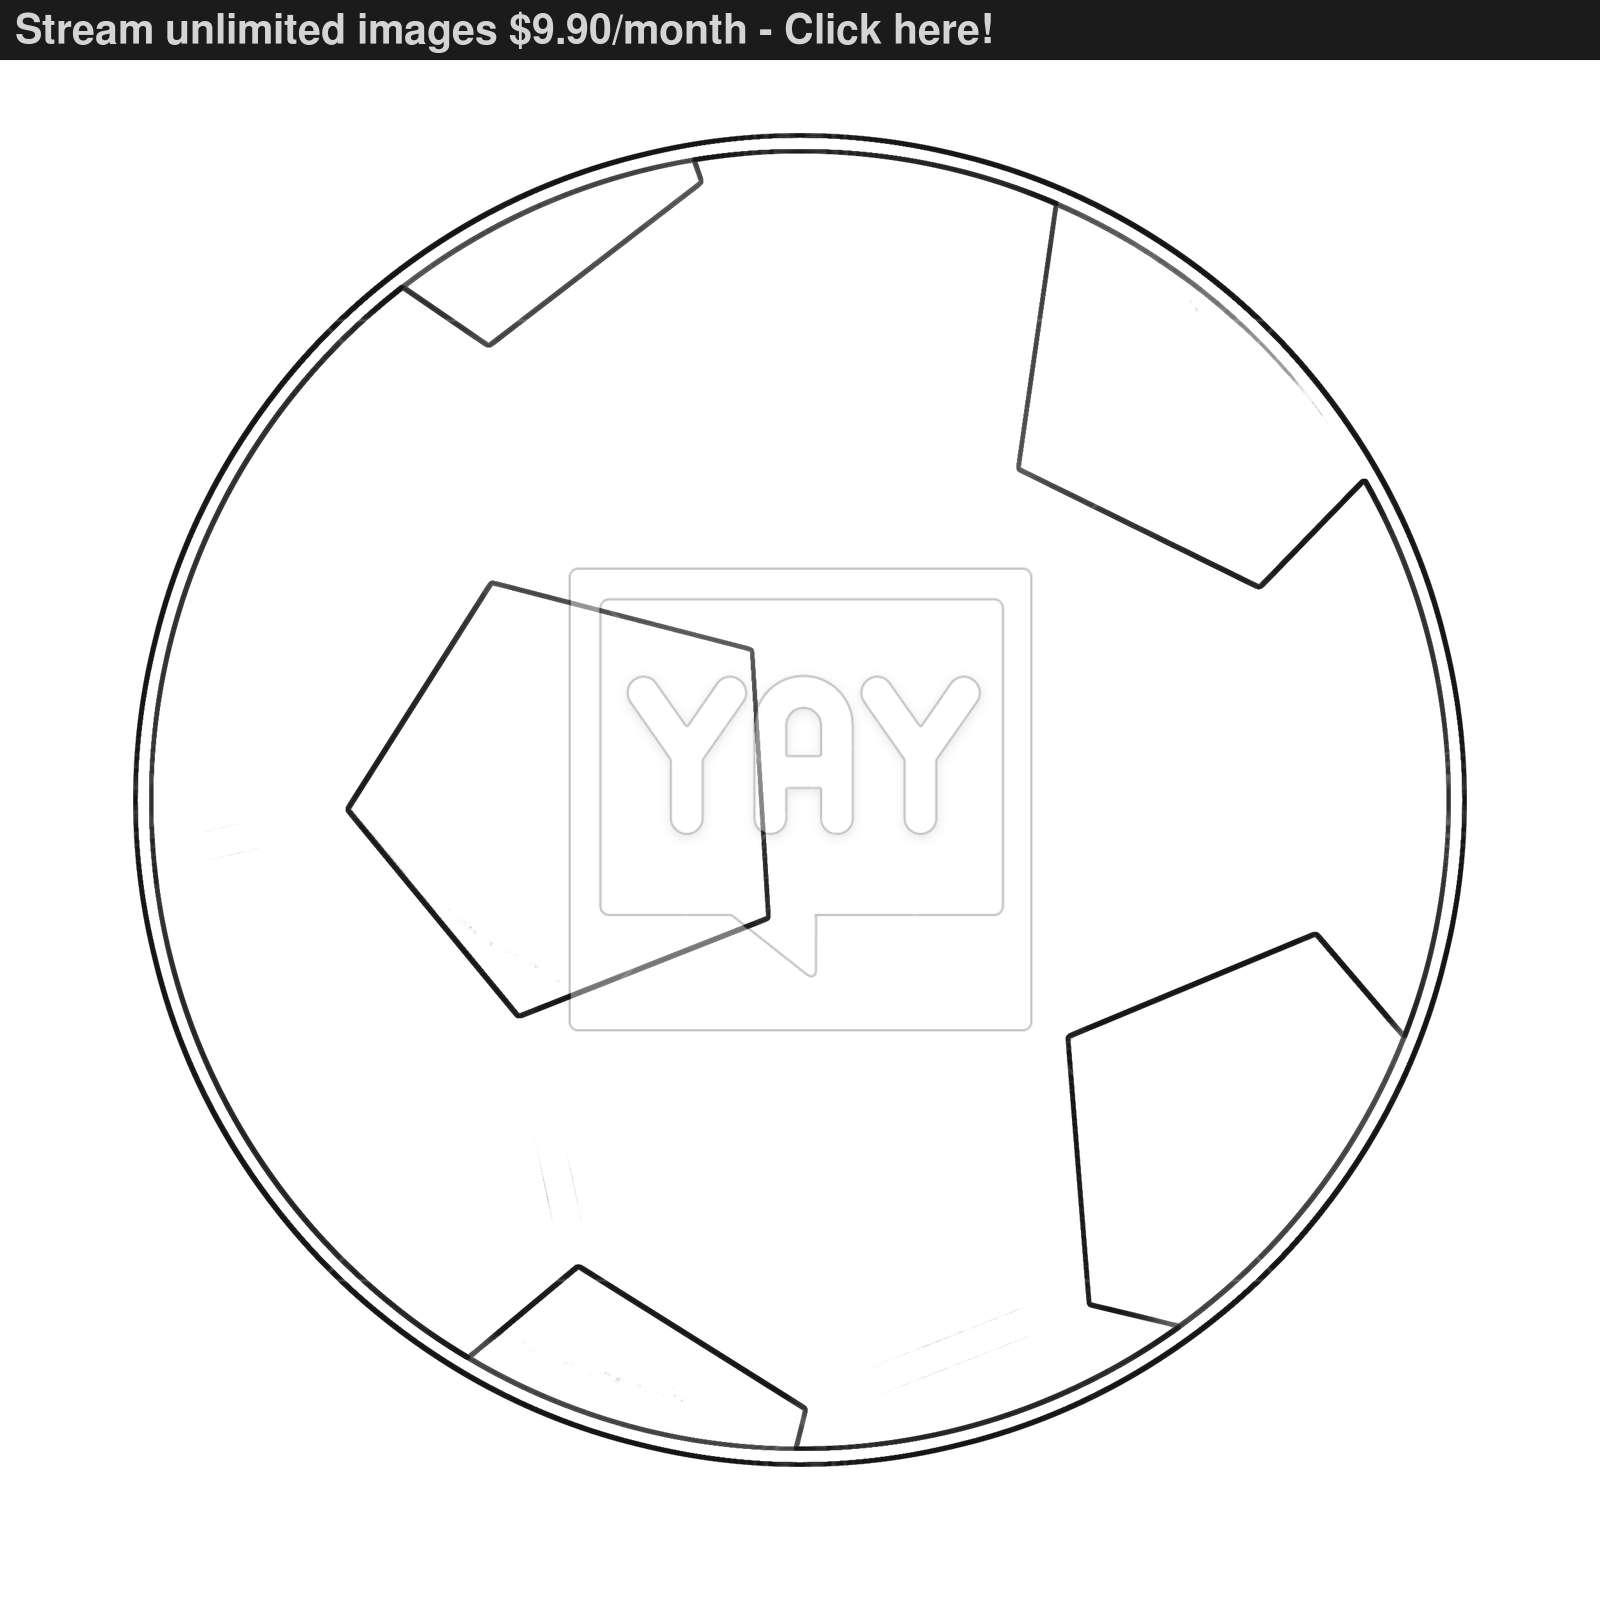 1600x1600 Illustration Coloring Book Series Sport Ball Football. Soccer